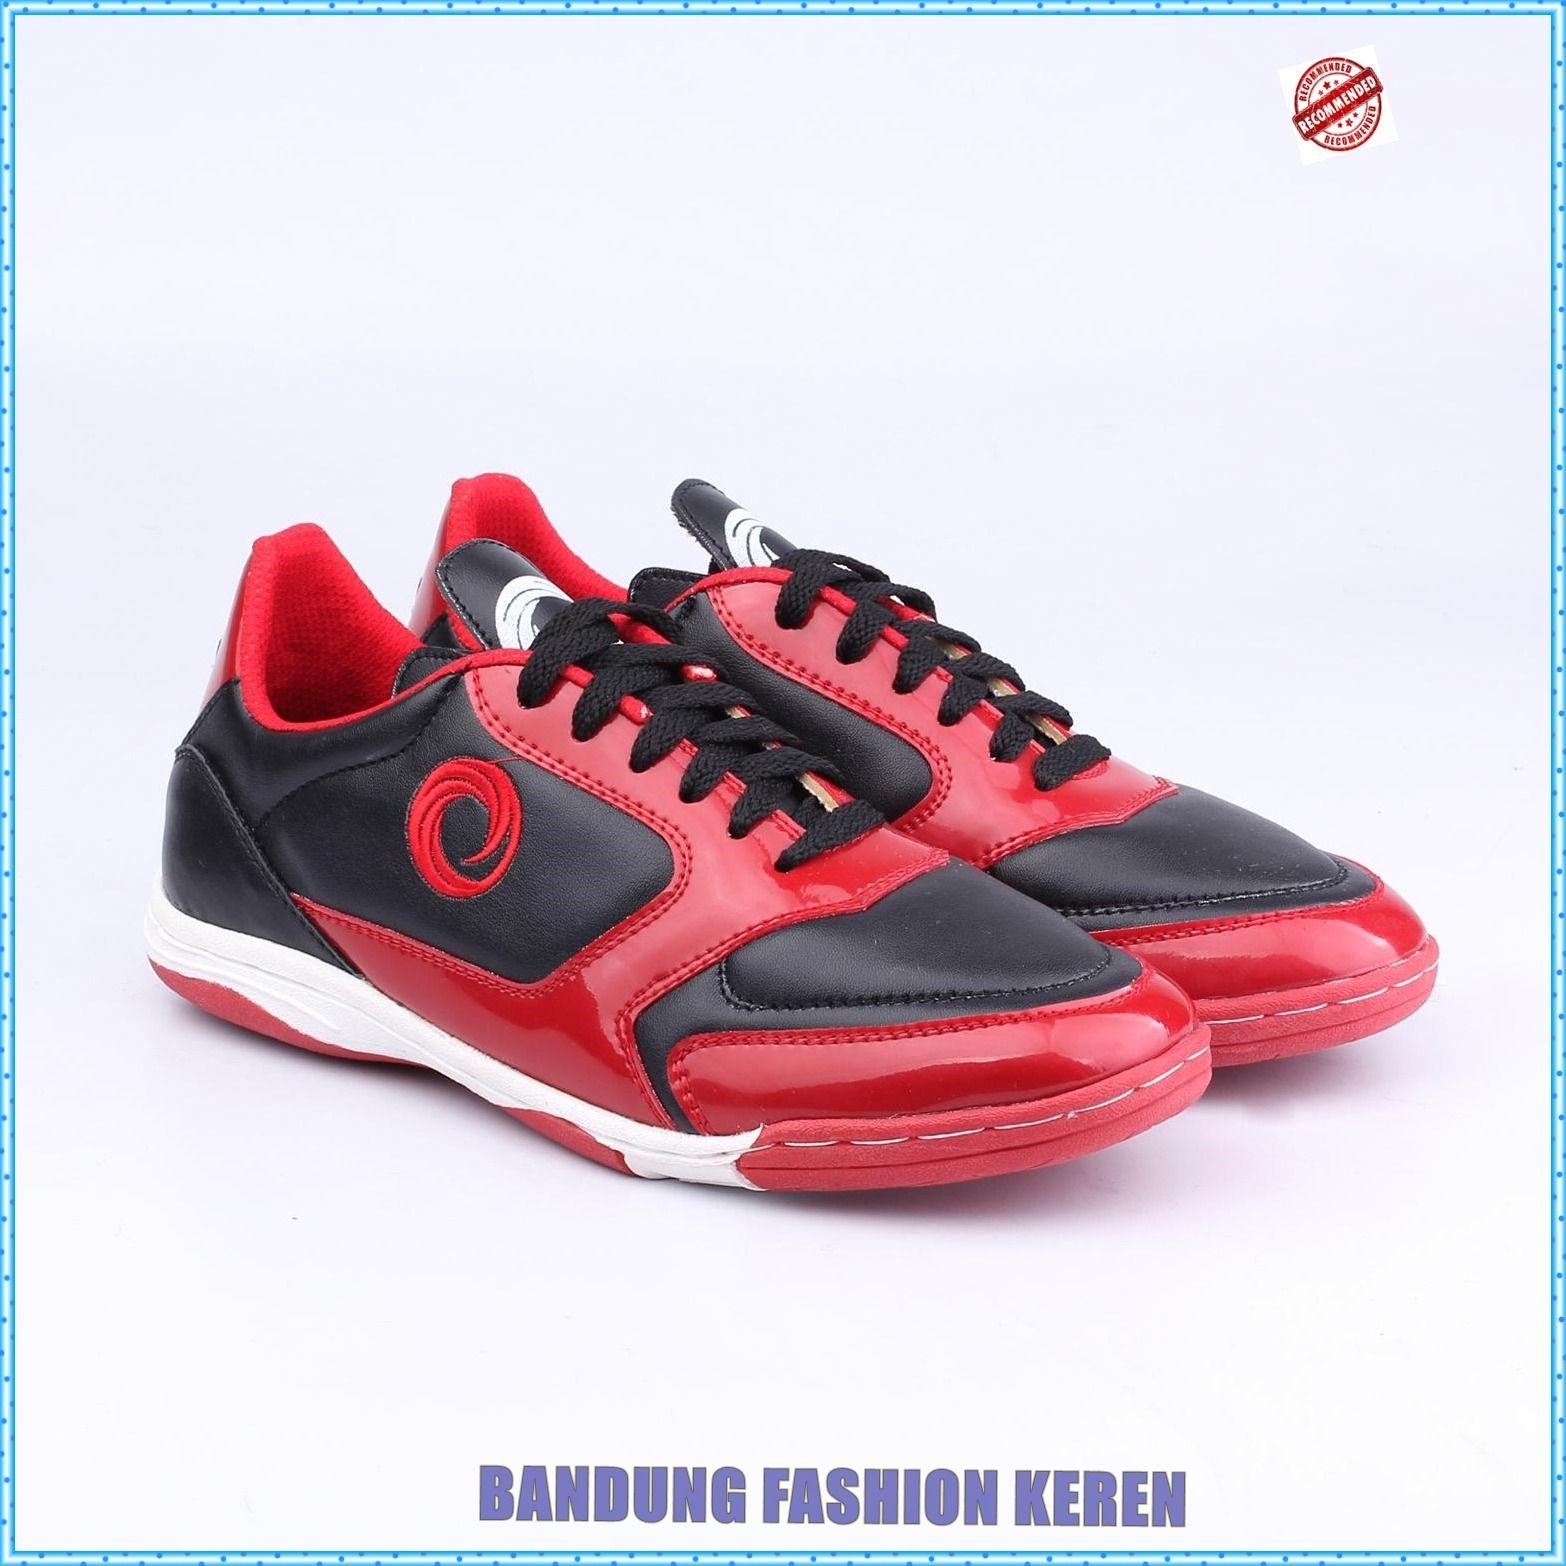 Sepatu Futsal Pria Ns 071 Produk Fashion Handmade Terbaik 100